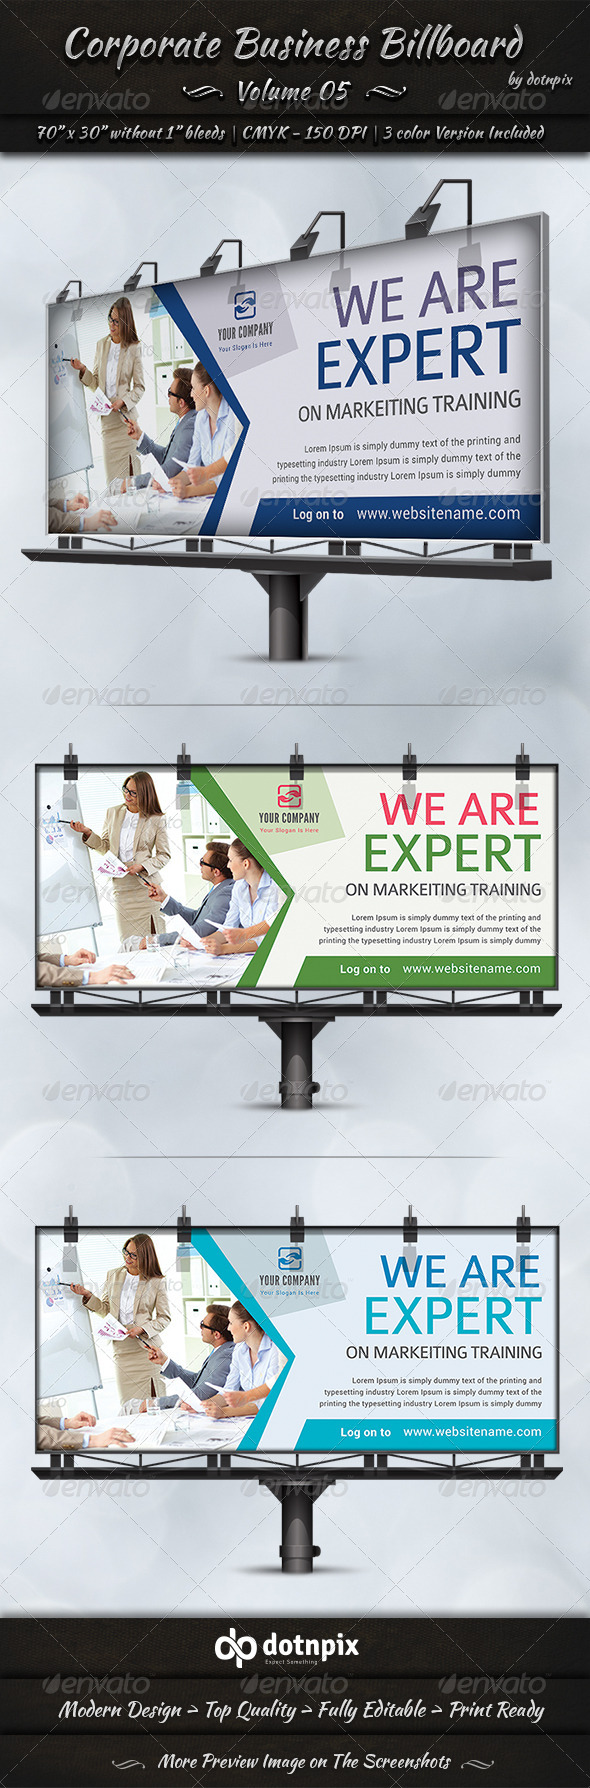 GraphicRiver Corporate Business Billboard Volume 5 7990456